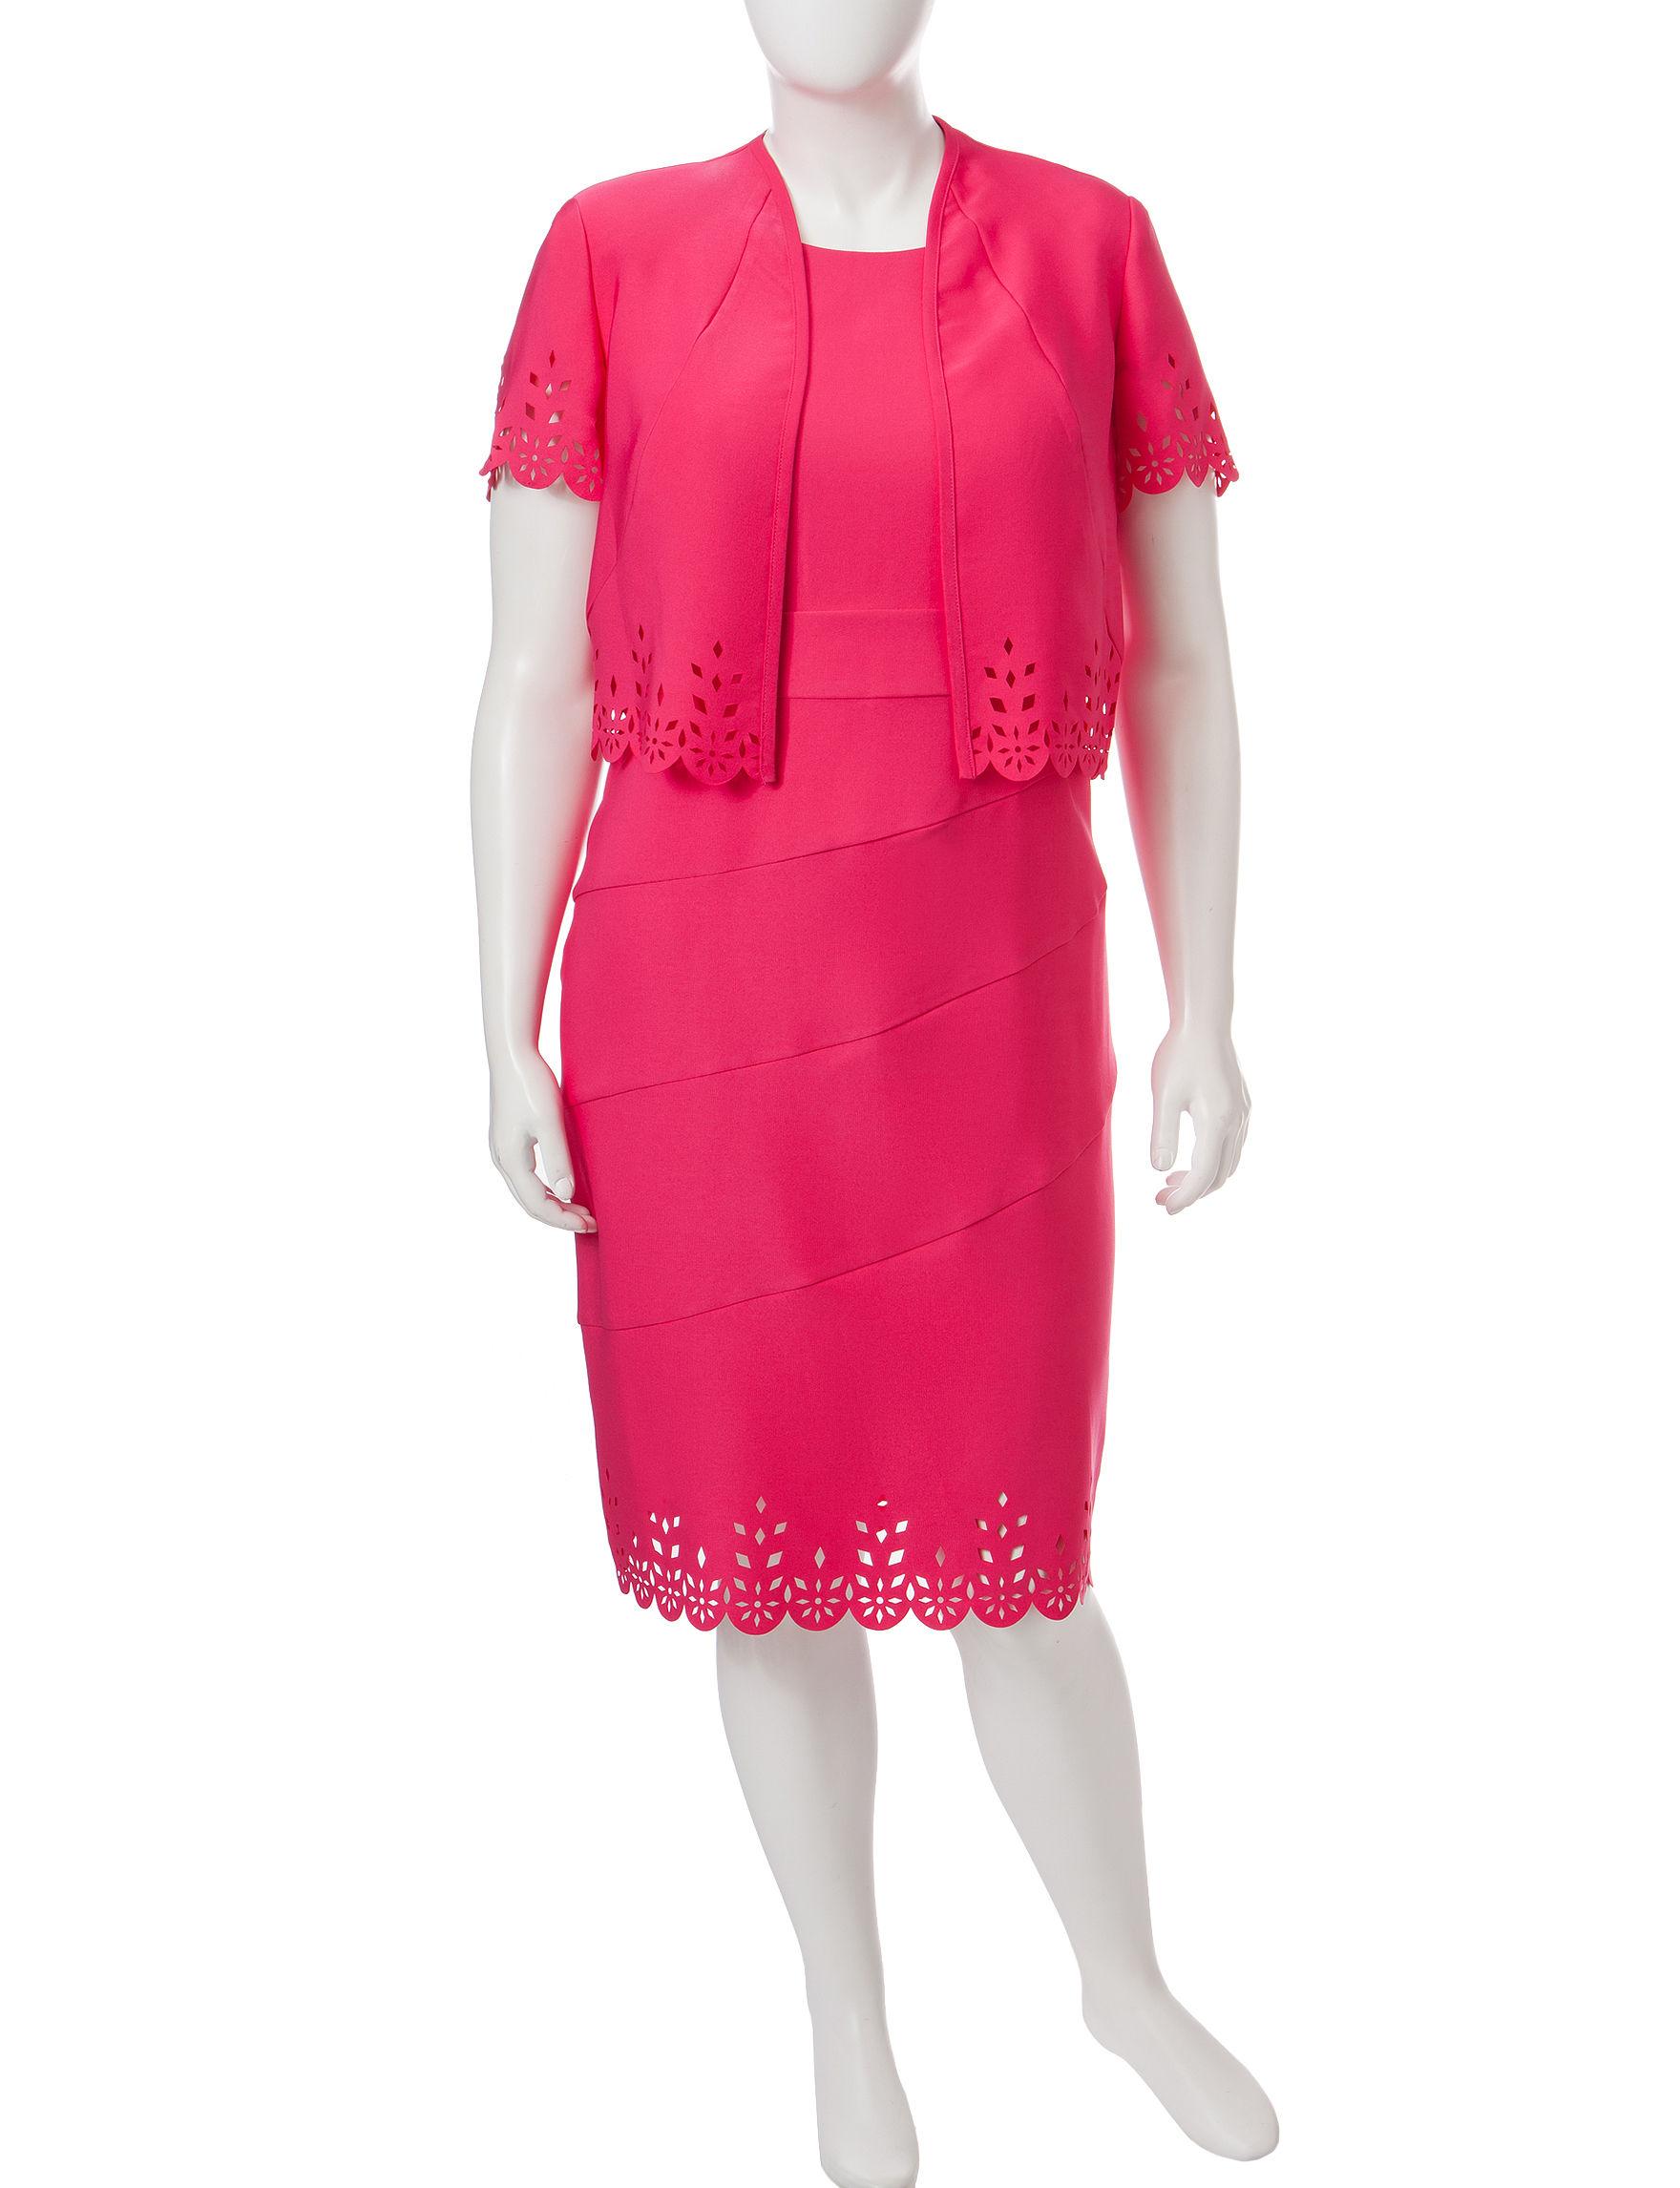 Dana Kay Hot Pink Cocktail & Party Jacket Dresses